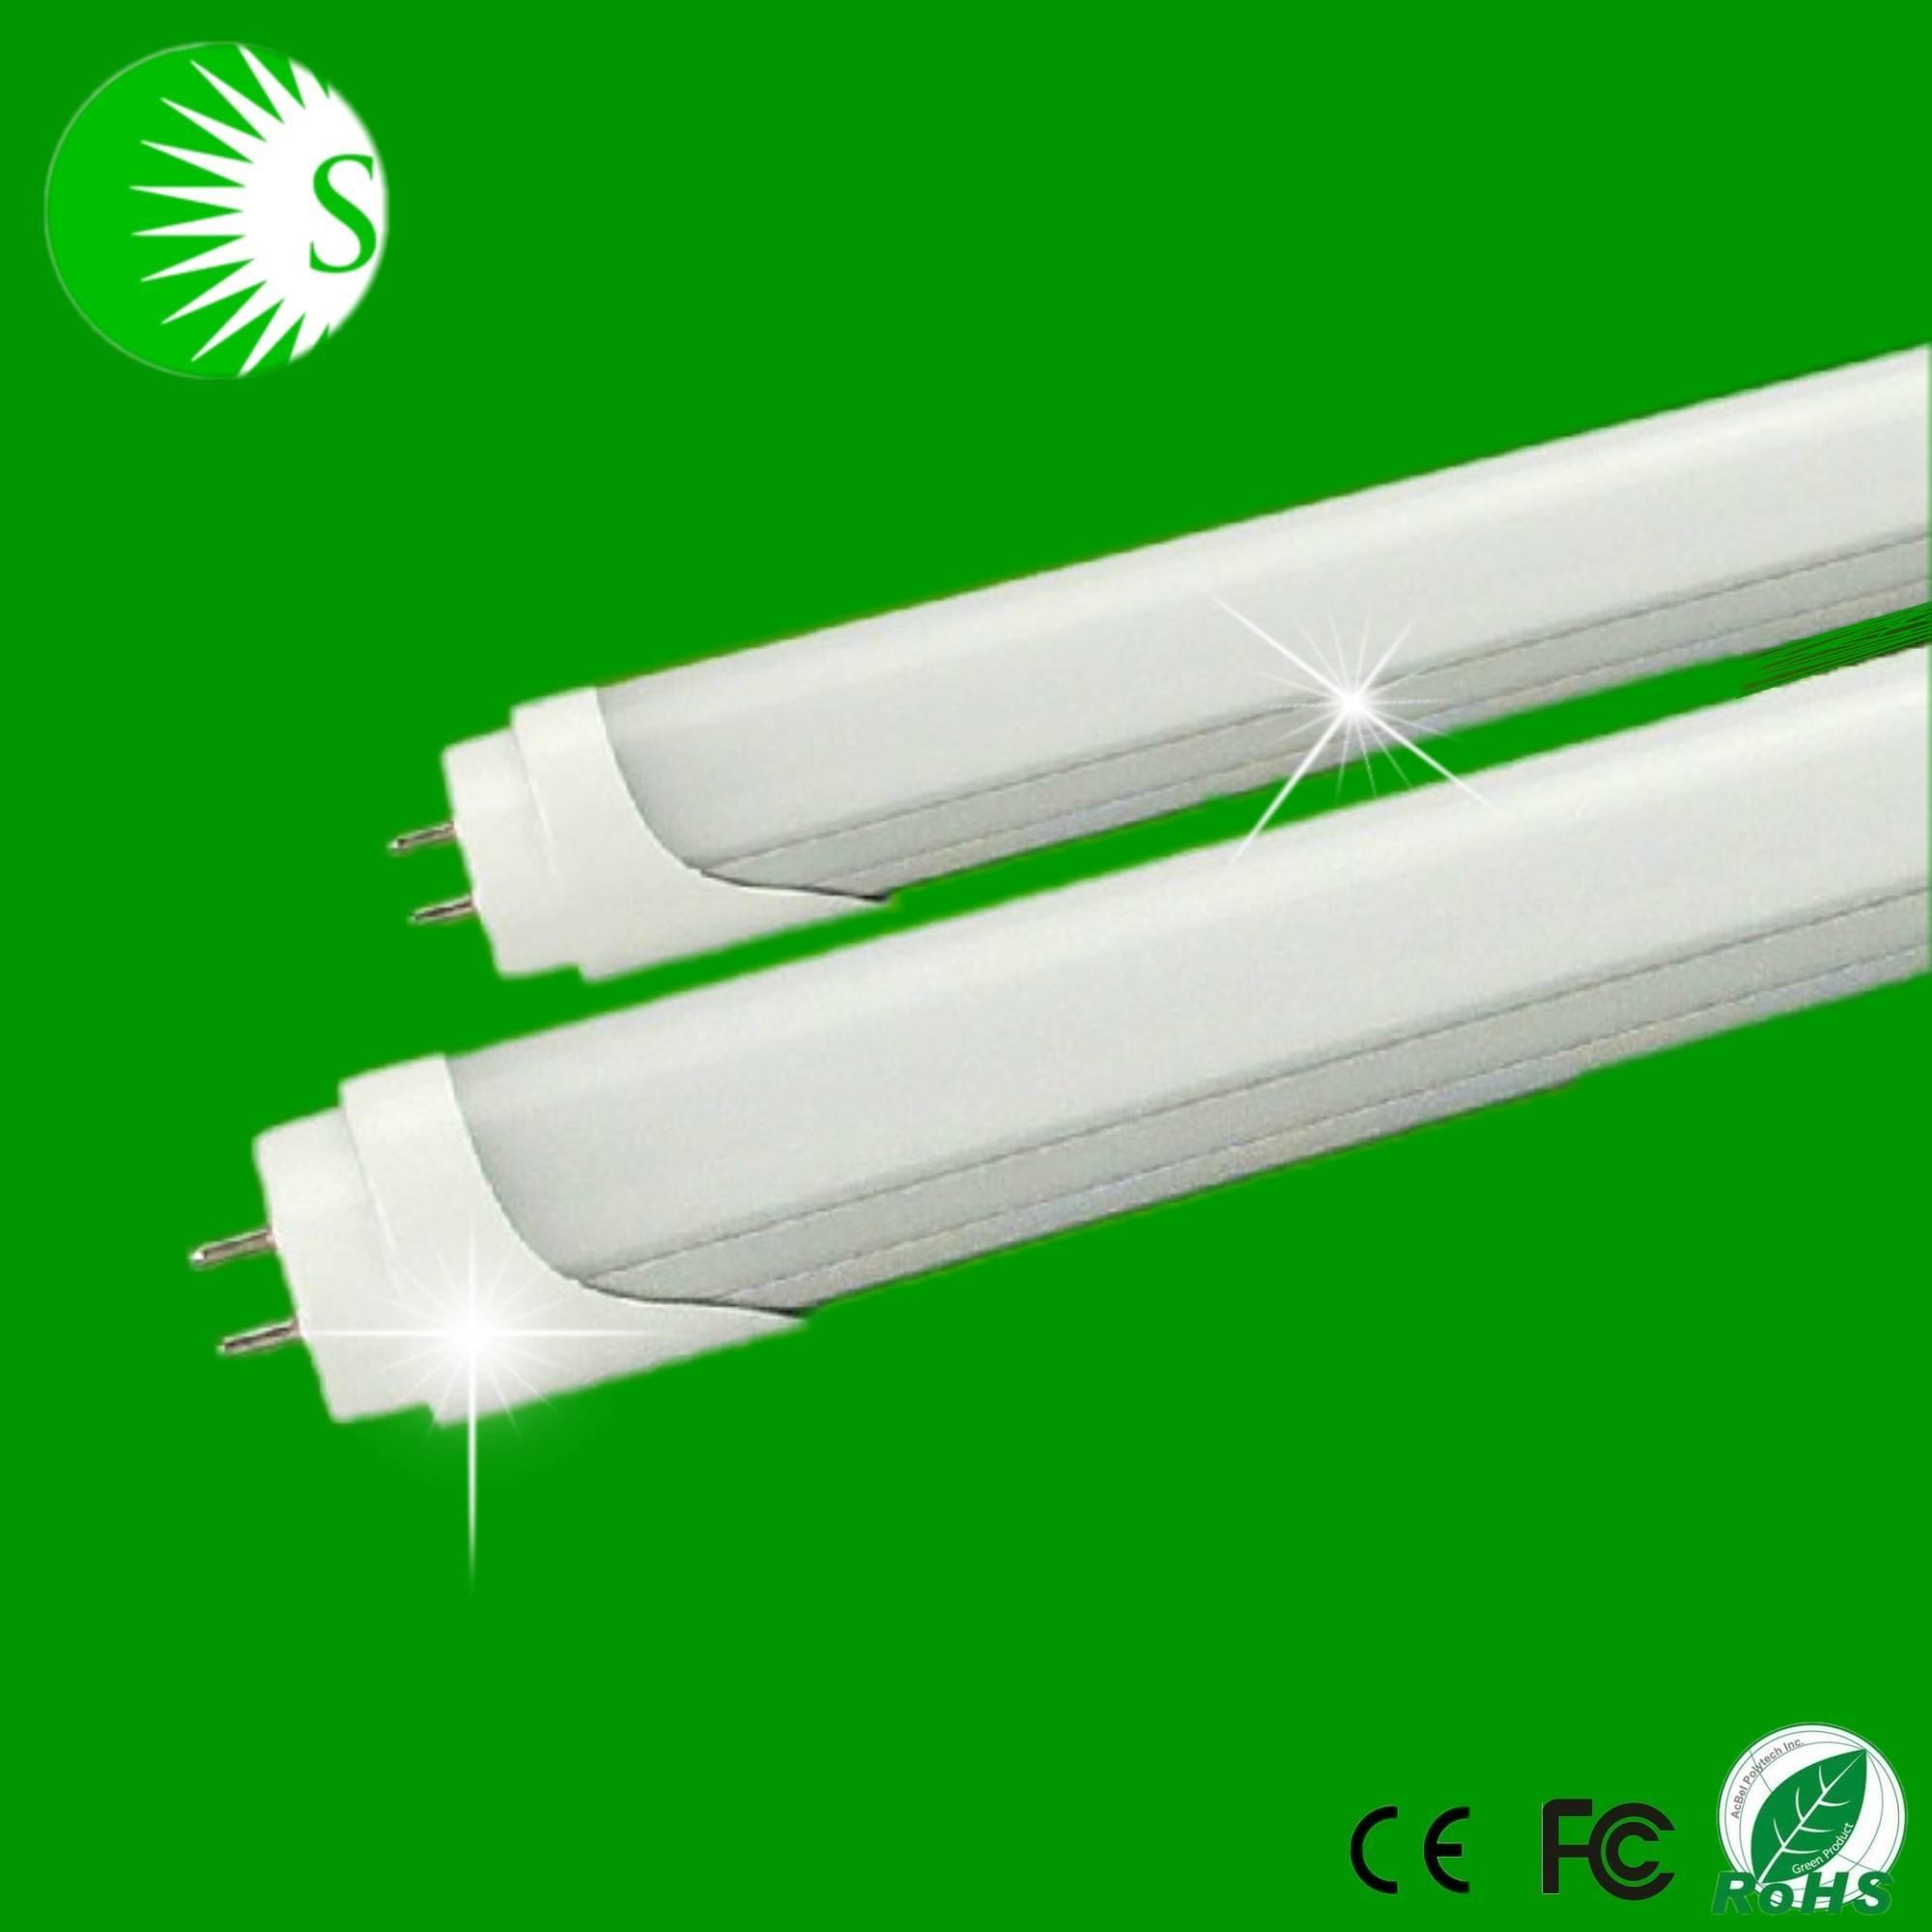 0.9m 1.2m 1.5m tube light wide voltage AC85-265V CRI80 Epister led SMD2835 18w t8 led tube light